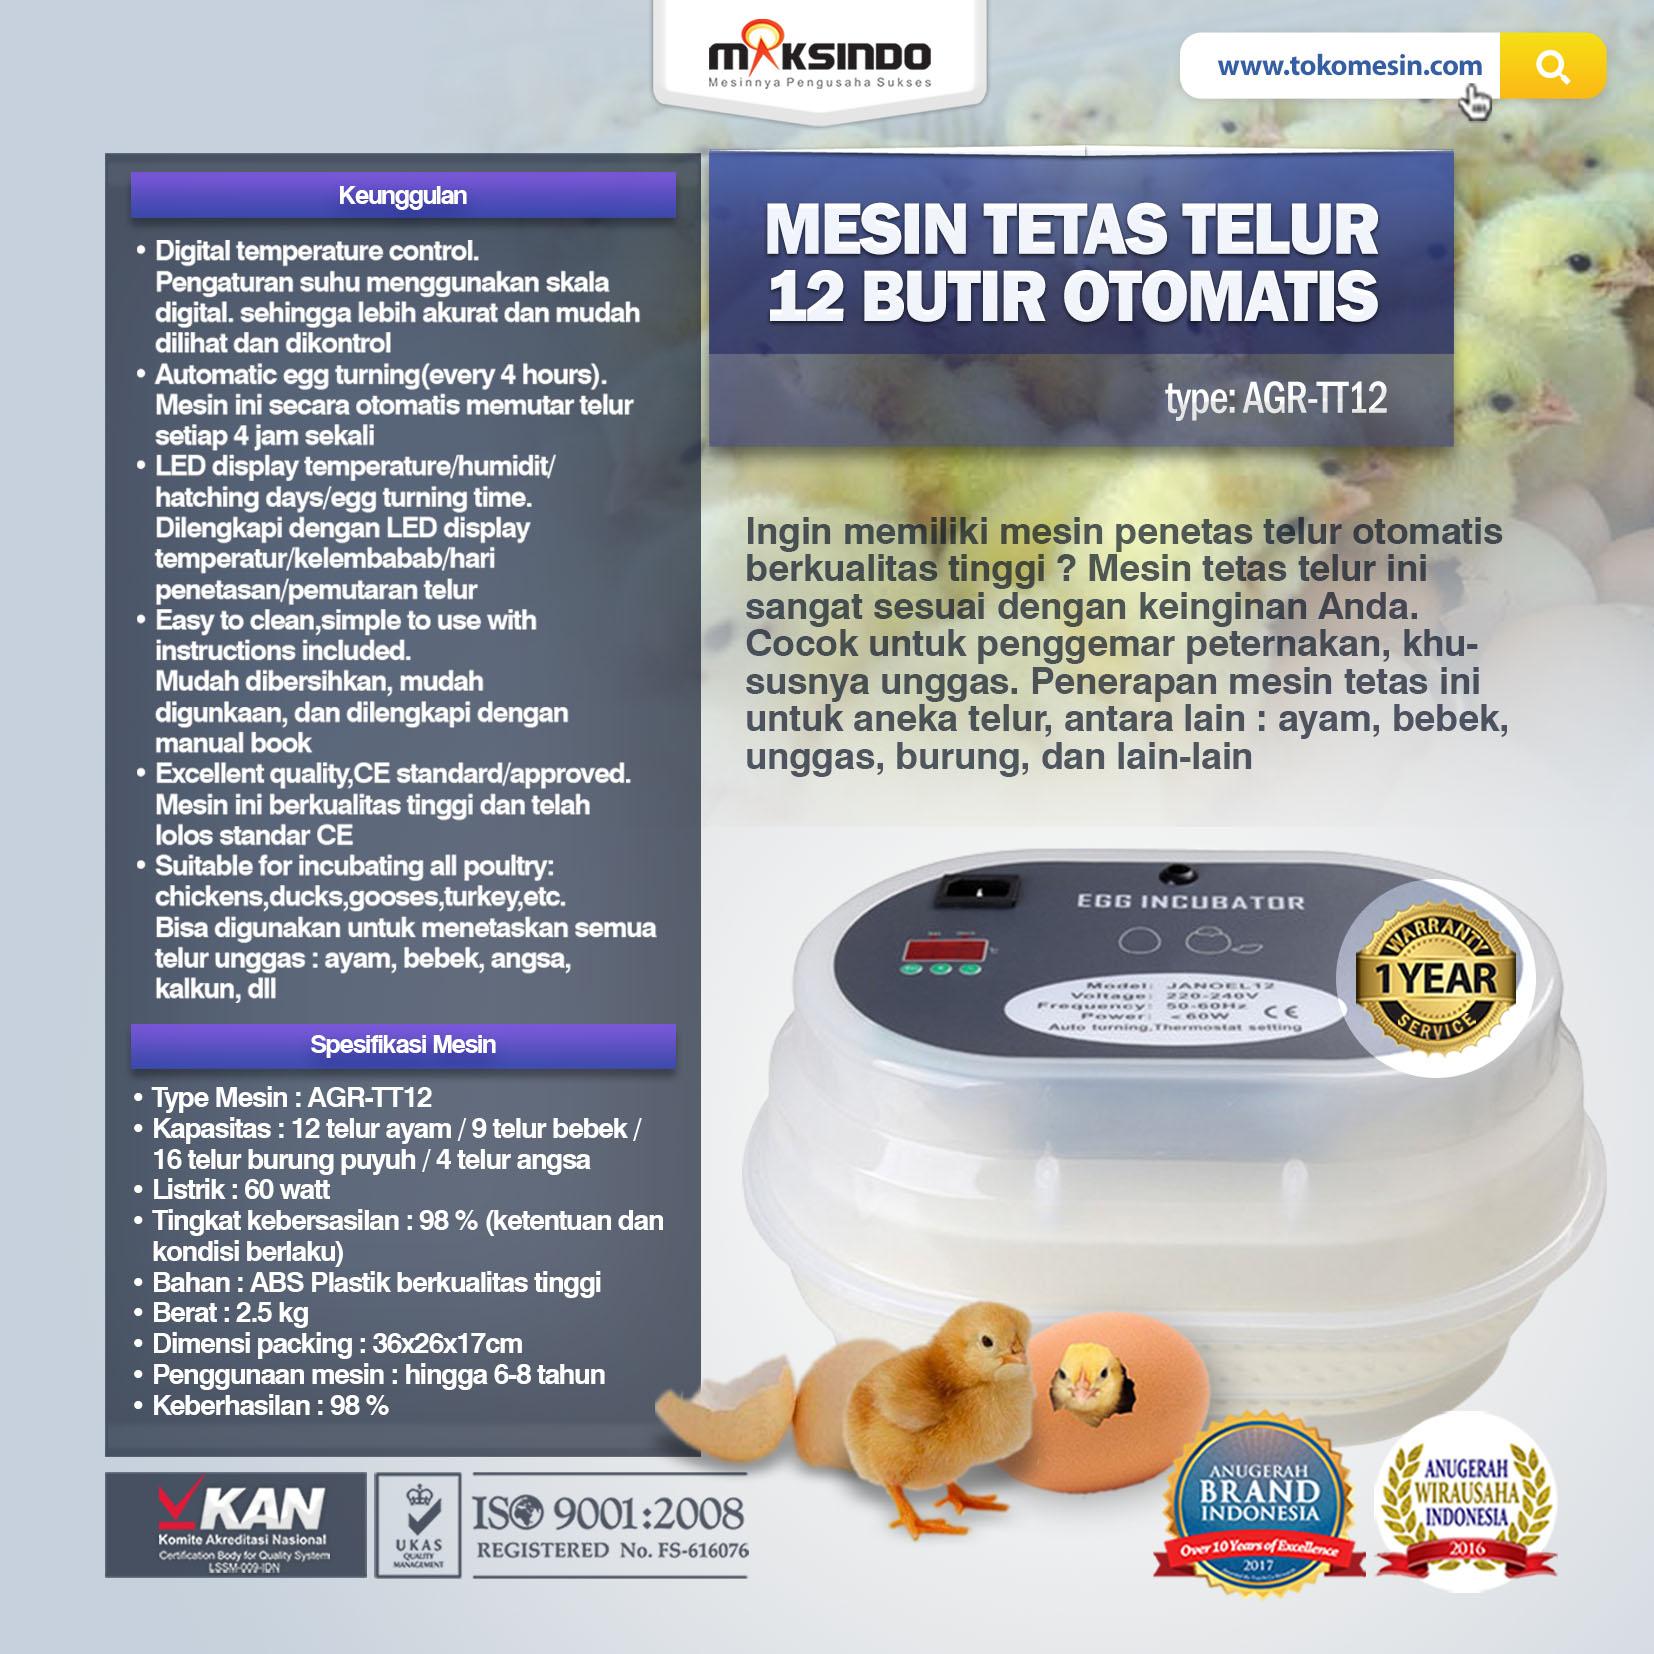 MESIN TETAS TELUR AGR-TT12